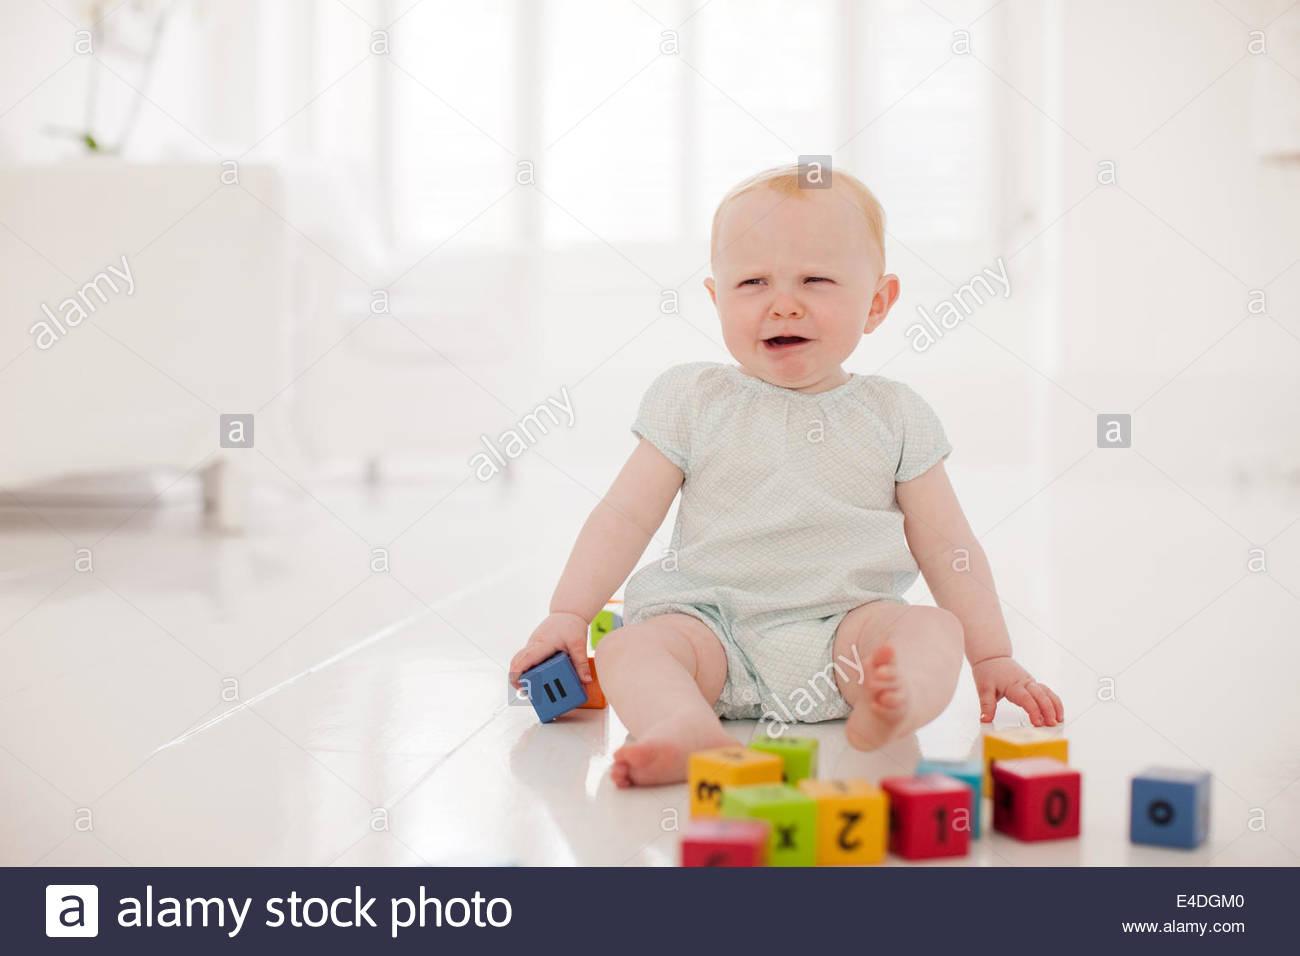 Baby  holding wood blocks and craying - Stock Image